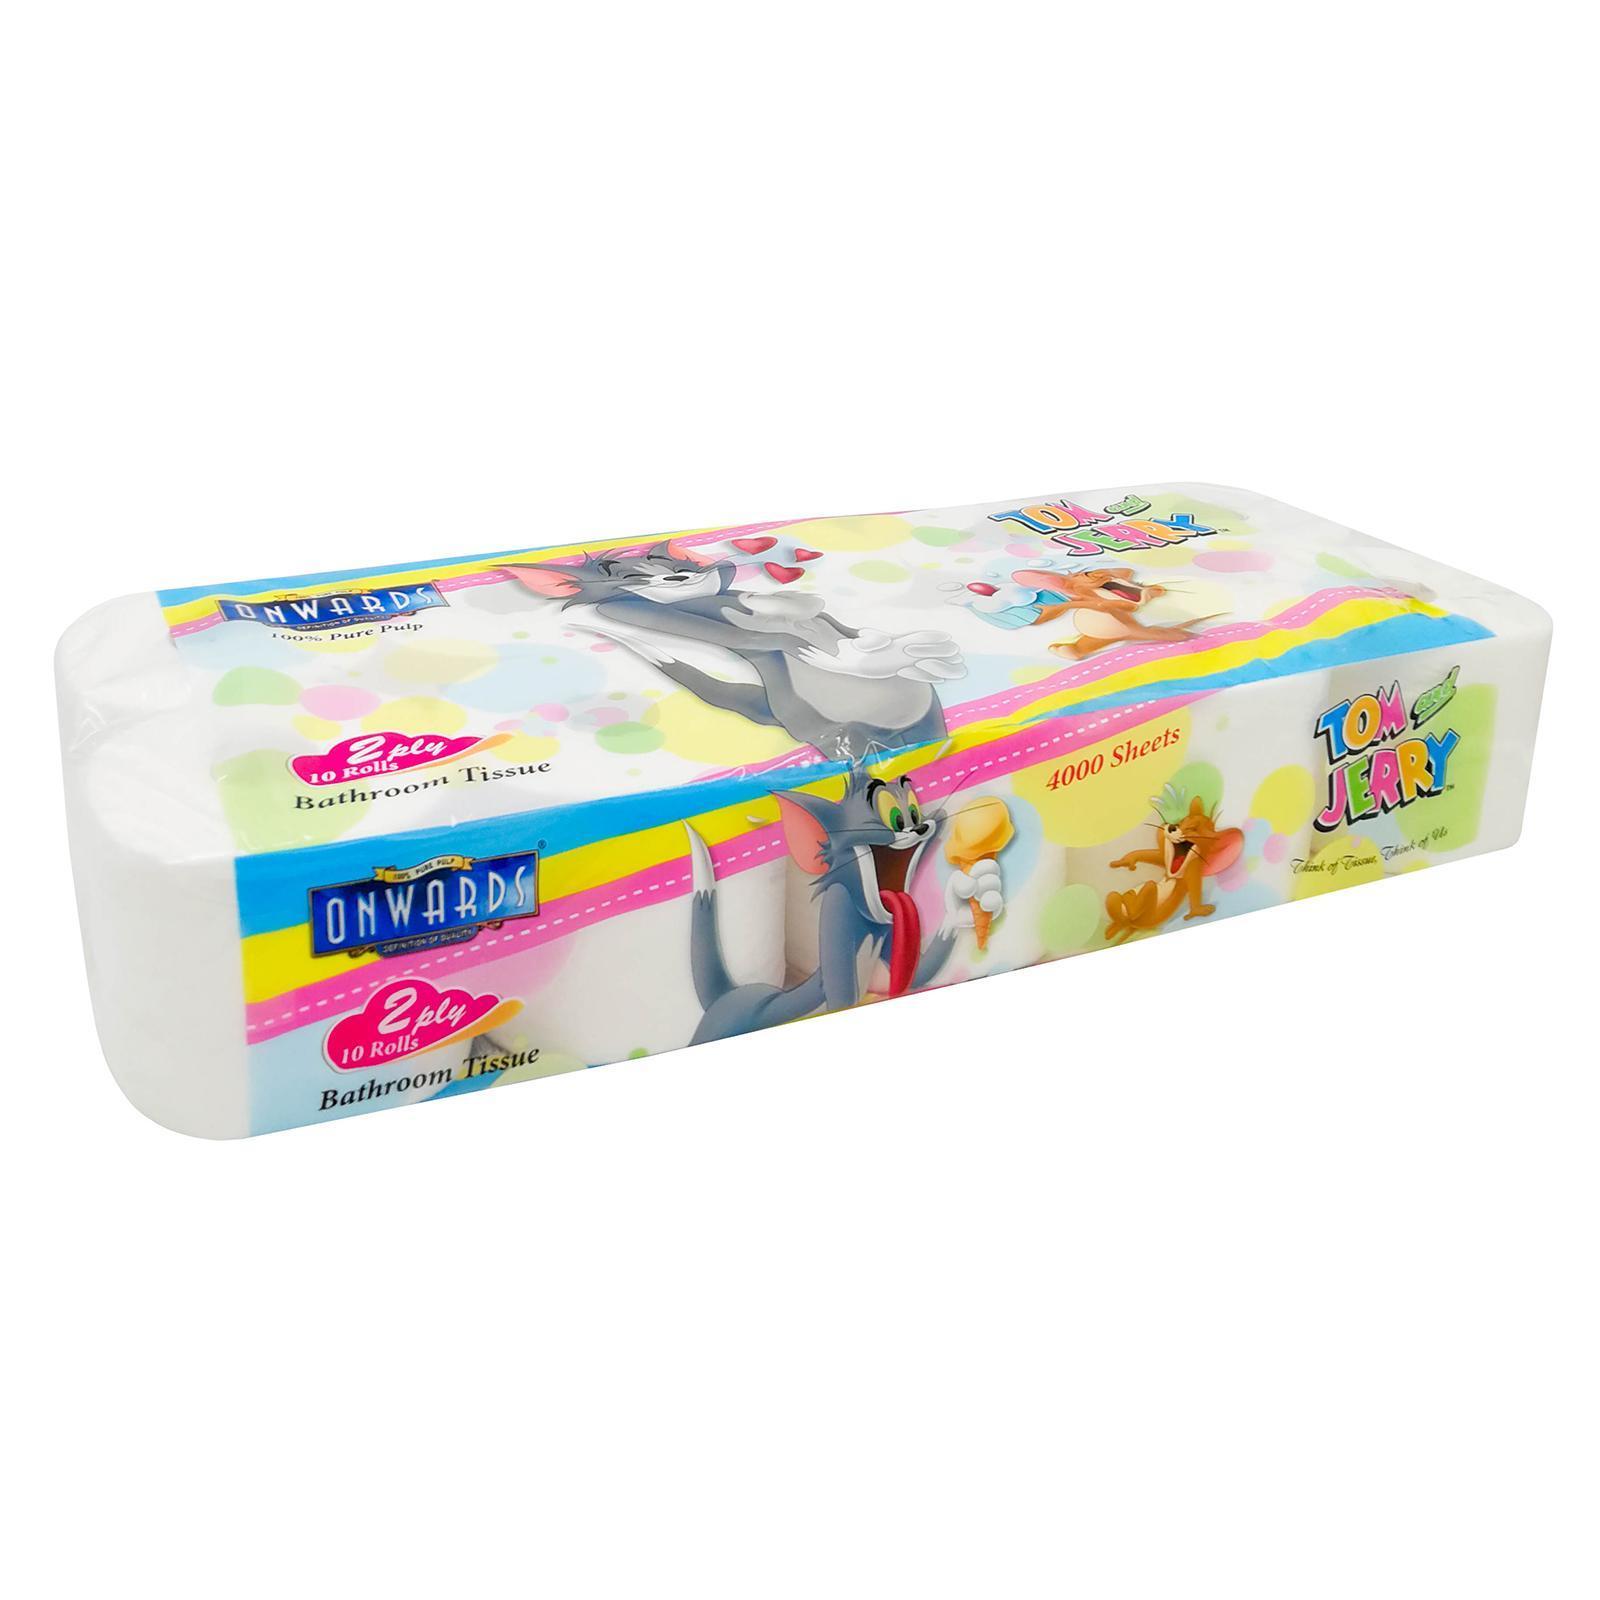 BEAUTEX 2 Ply Premium Toilet Rolls 10+2s